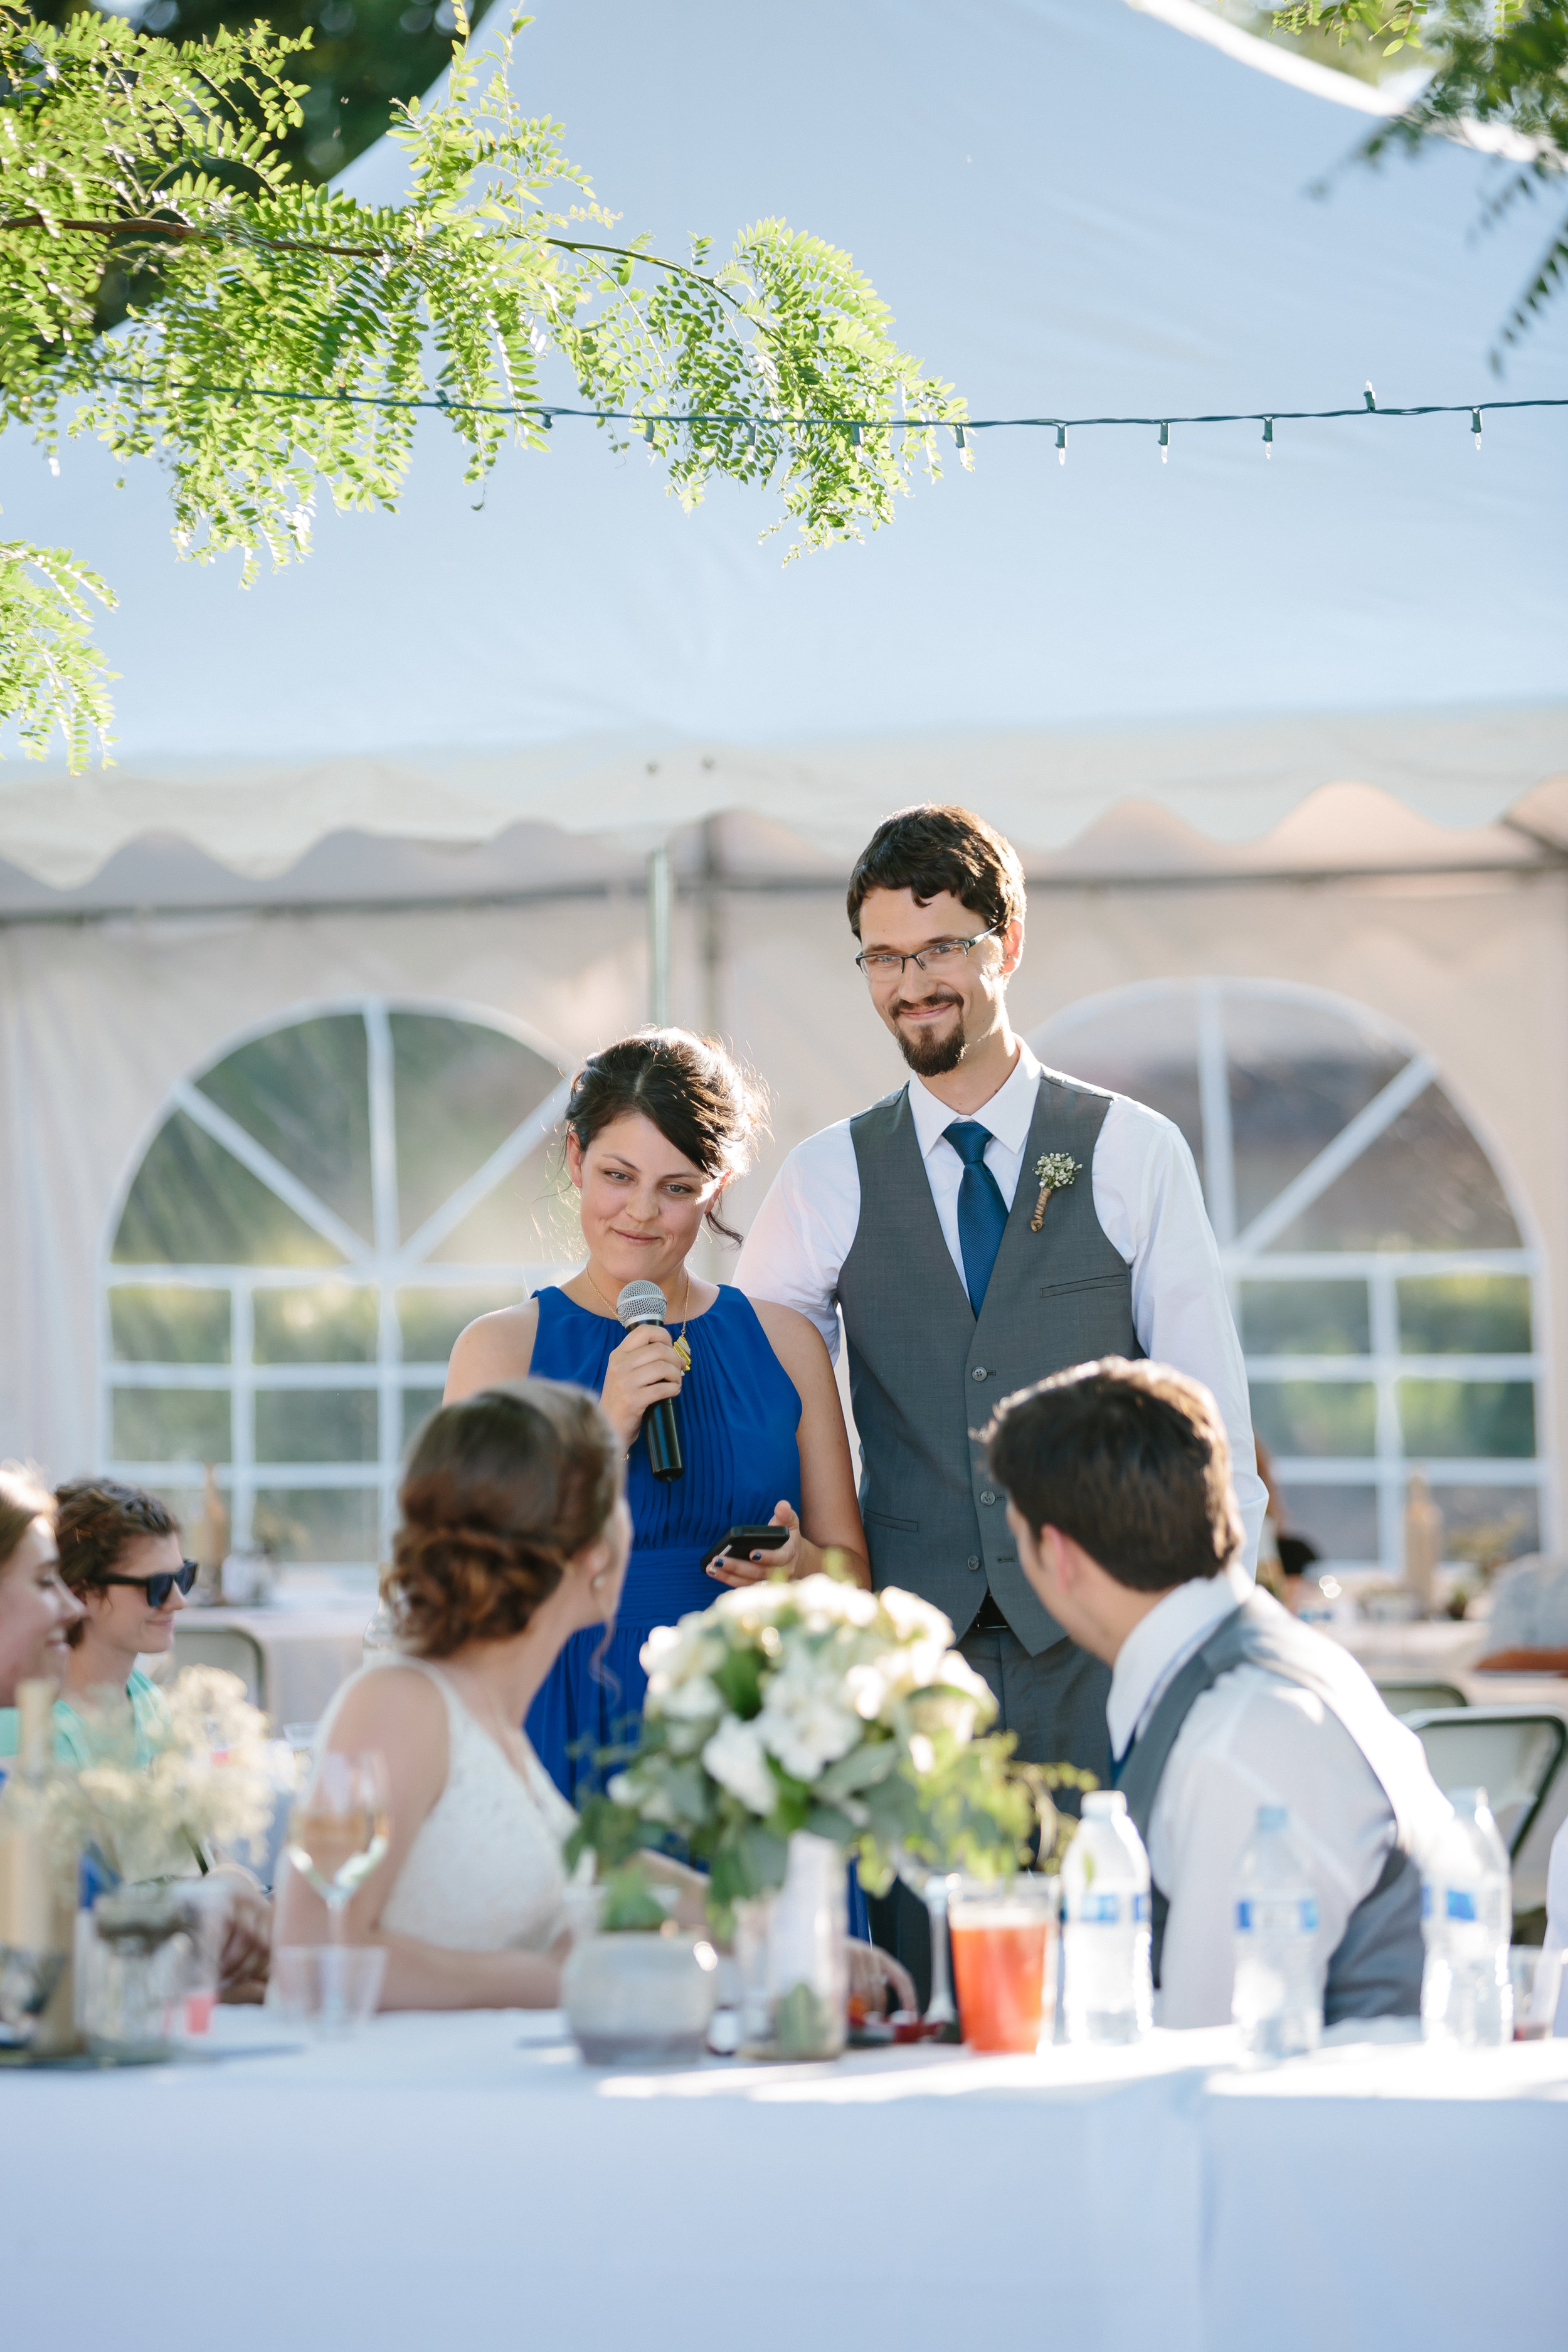 Jordan & Shantel Married - Idaho - Corrie Mick Photography-283.jpg